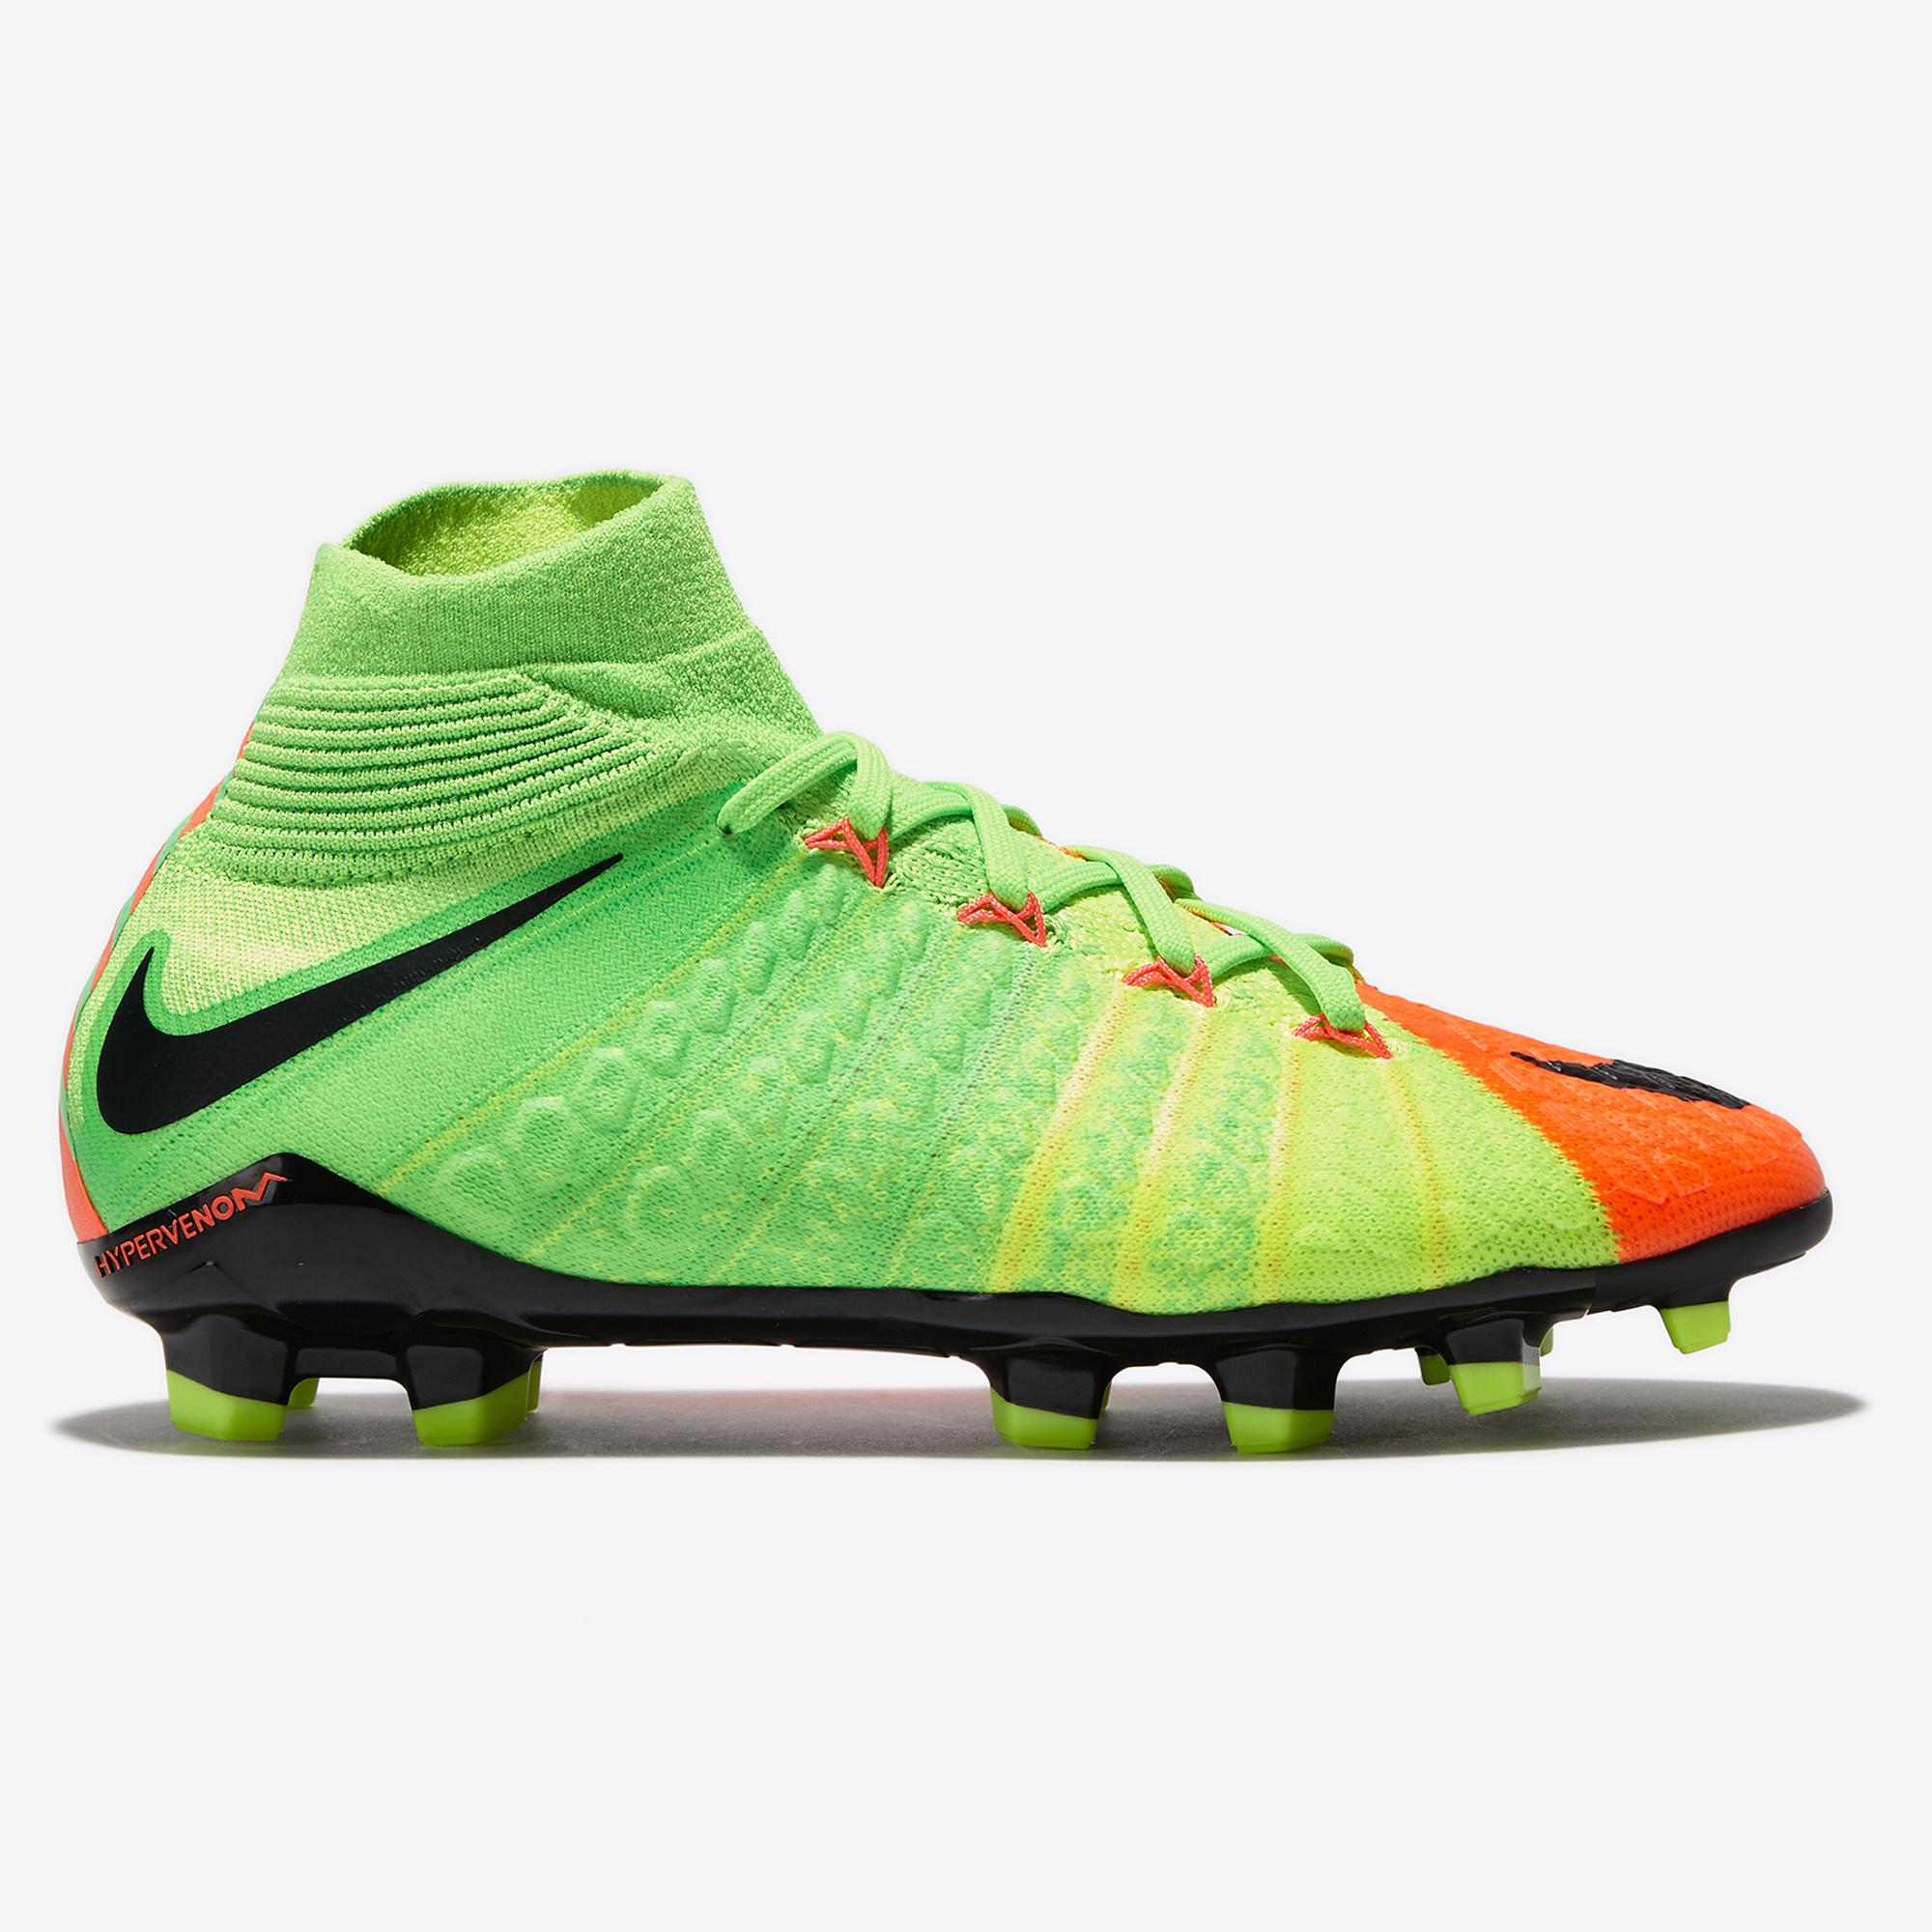 Nike Hypervenom Phantom III Firm Ground Football Boots - Electric Gree